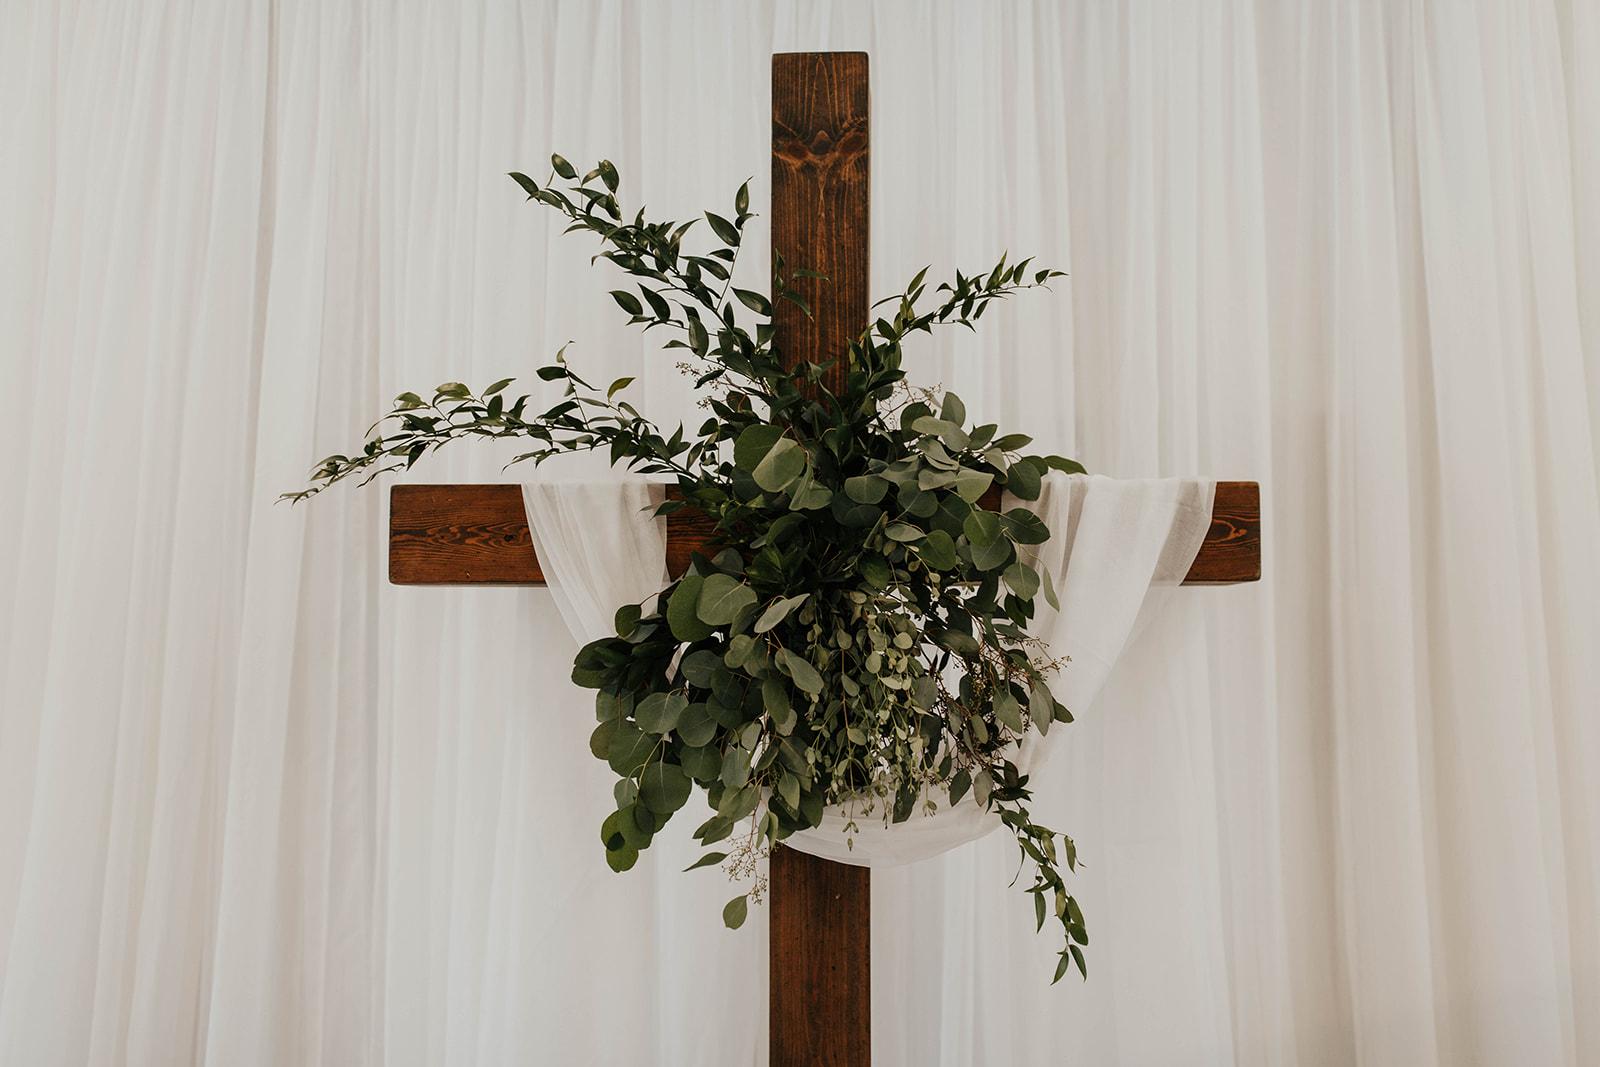 Tulsa Bixby Oklahoma Best Wedding and Reception Venue 4.jpg